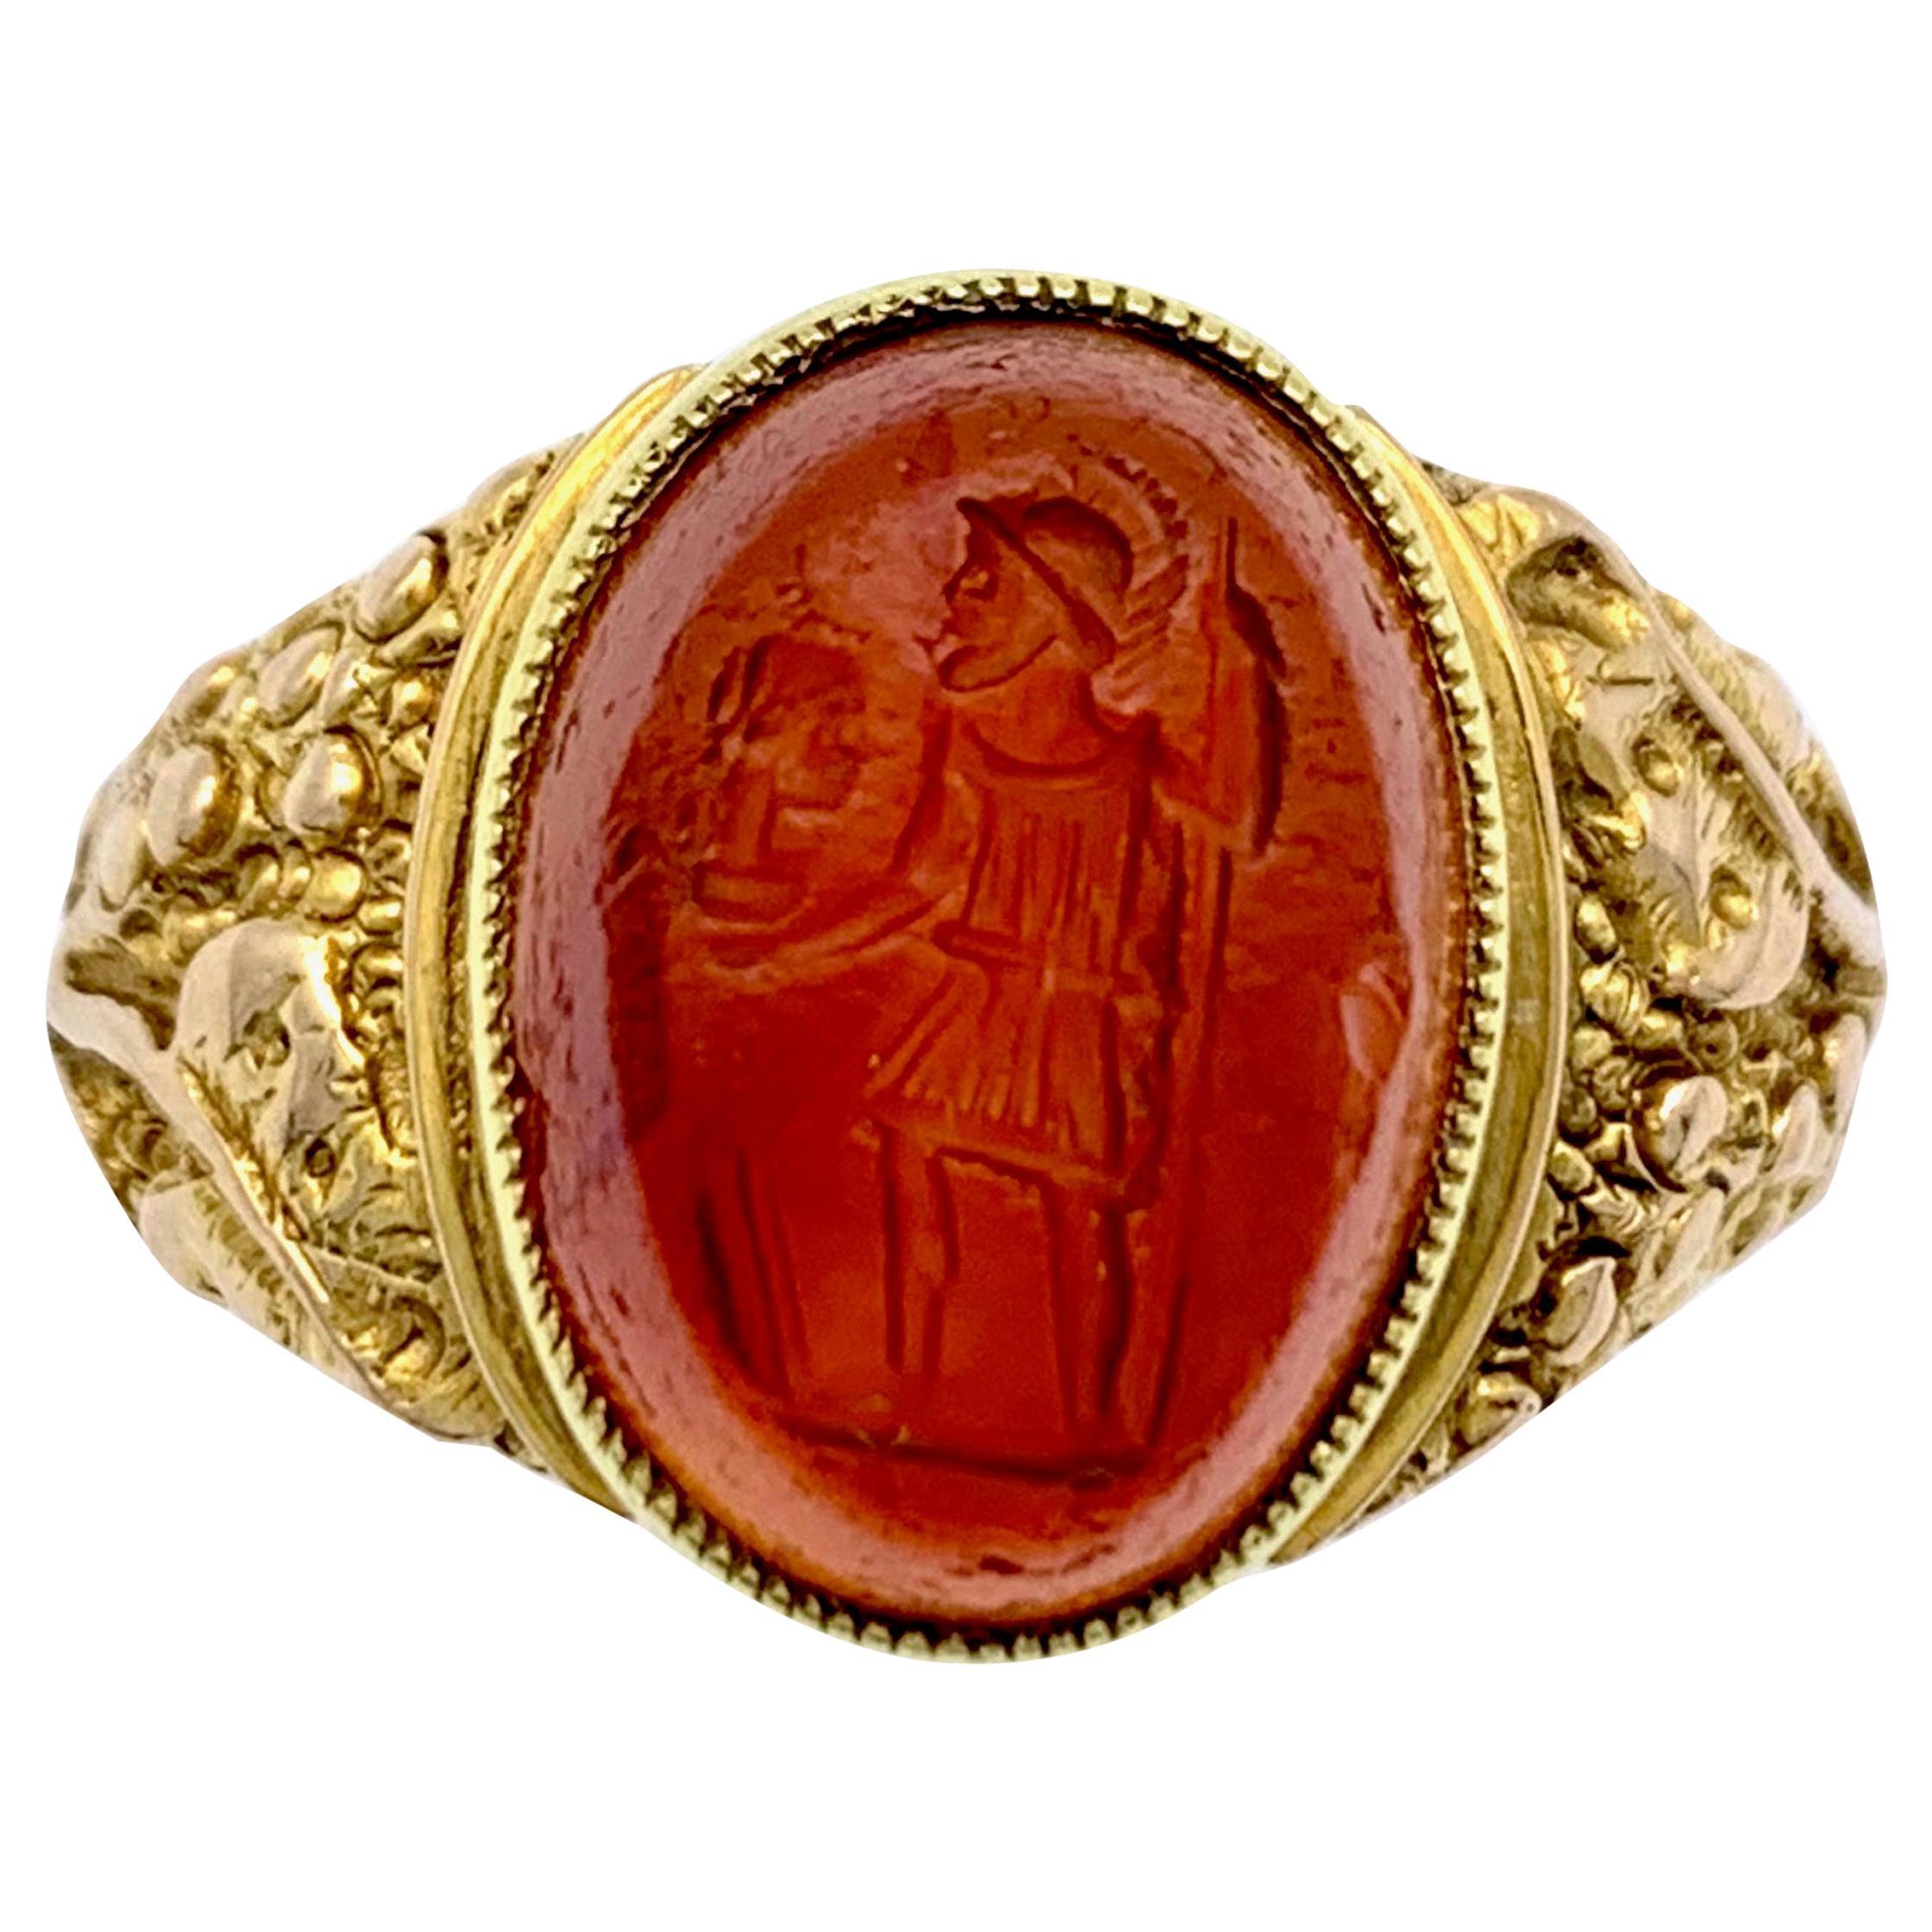 Antique Roman Intaglio in  English Arts & Crafts 9 Karat Gold Setting